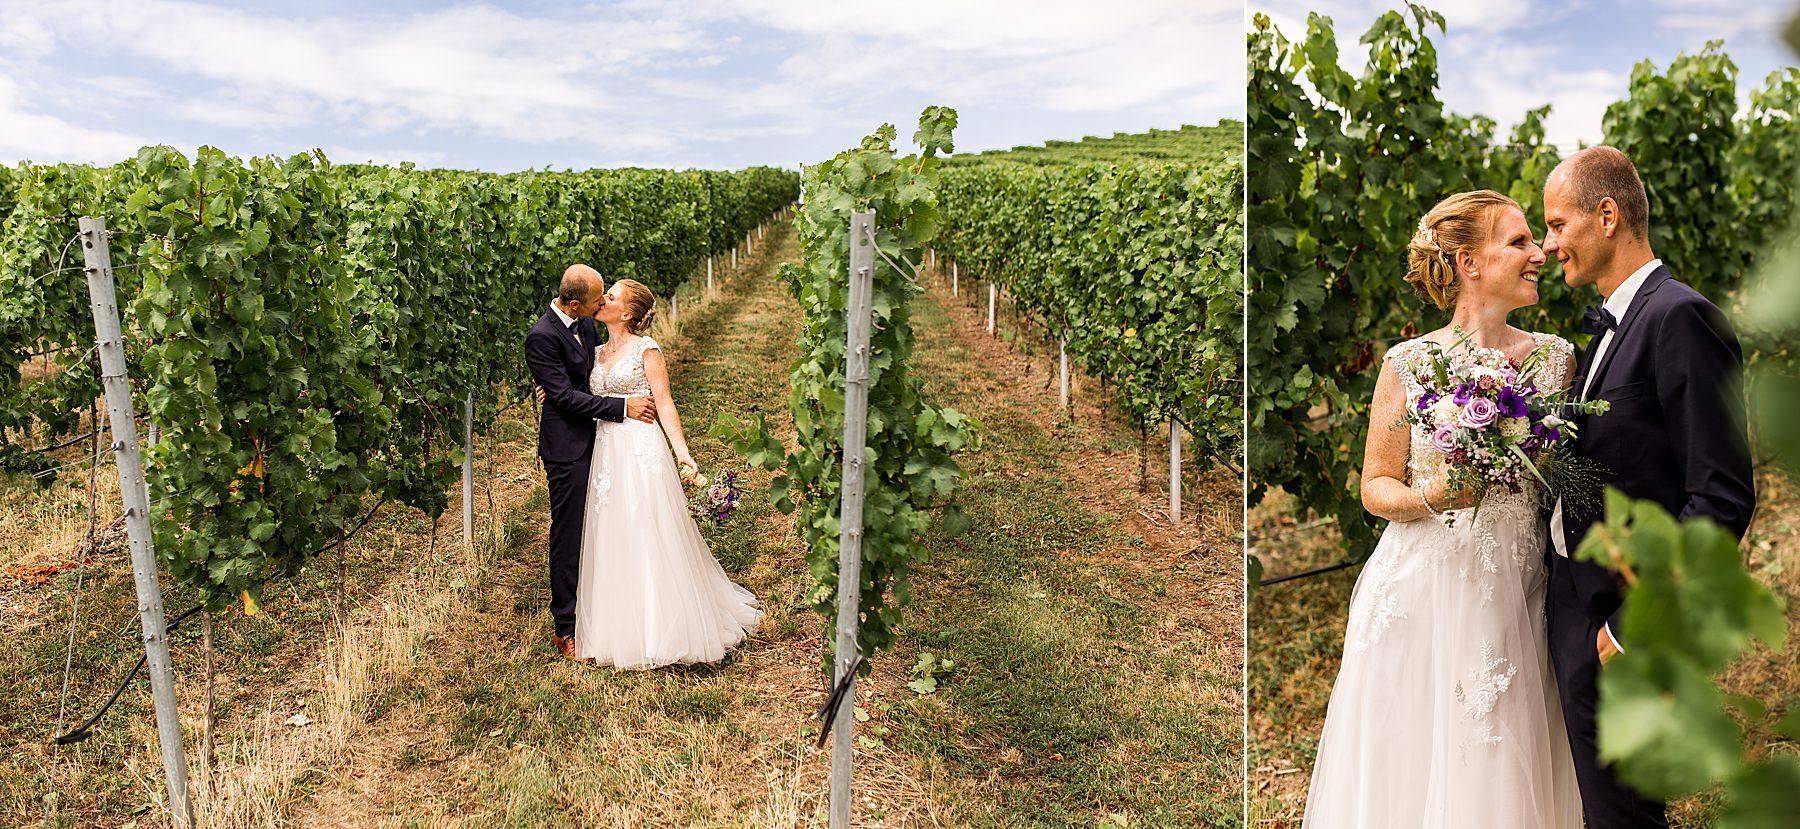 Hochzeitsfotograf Daniela Knipper auf dem Weingut in Heilbronn